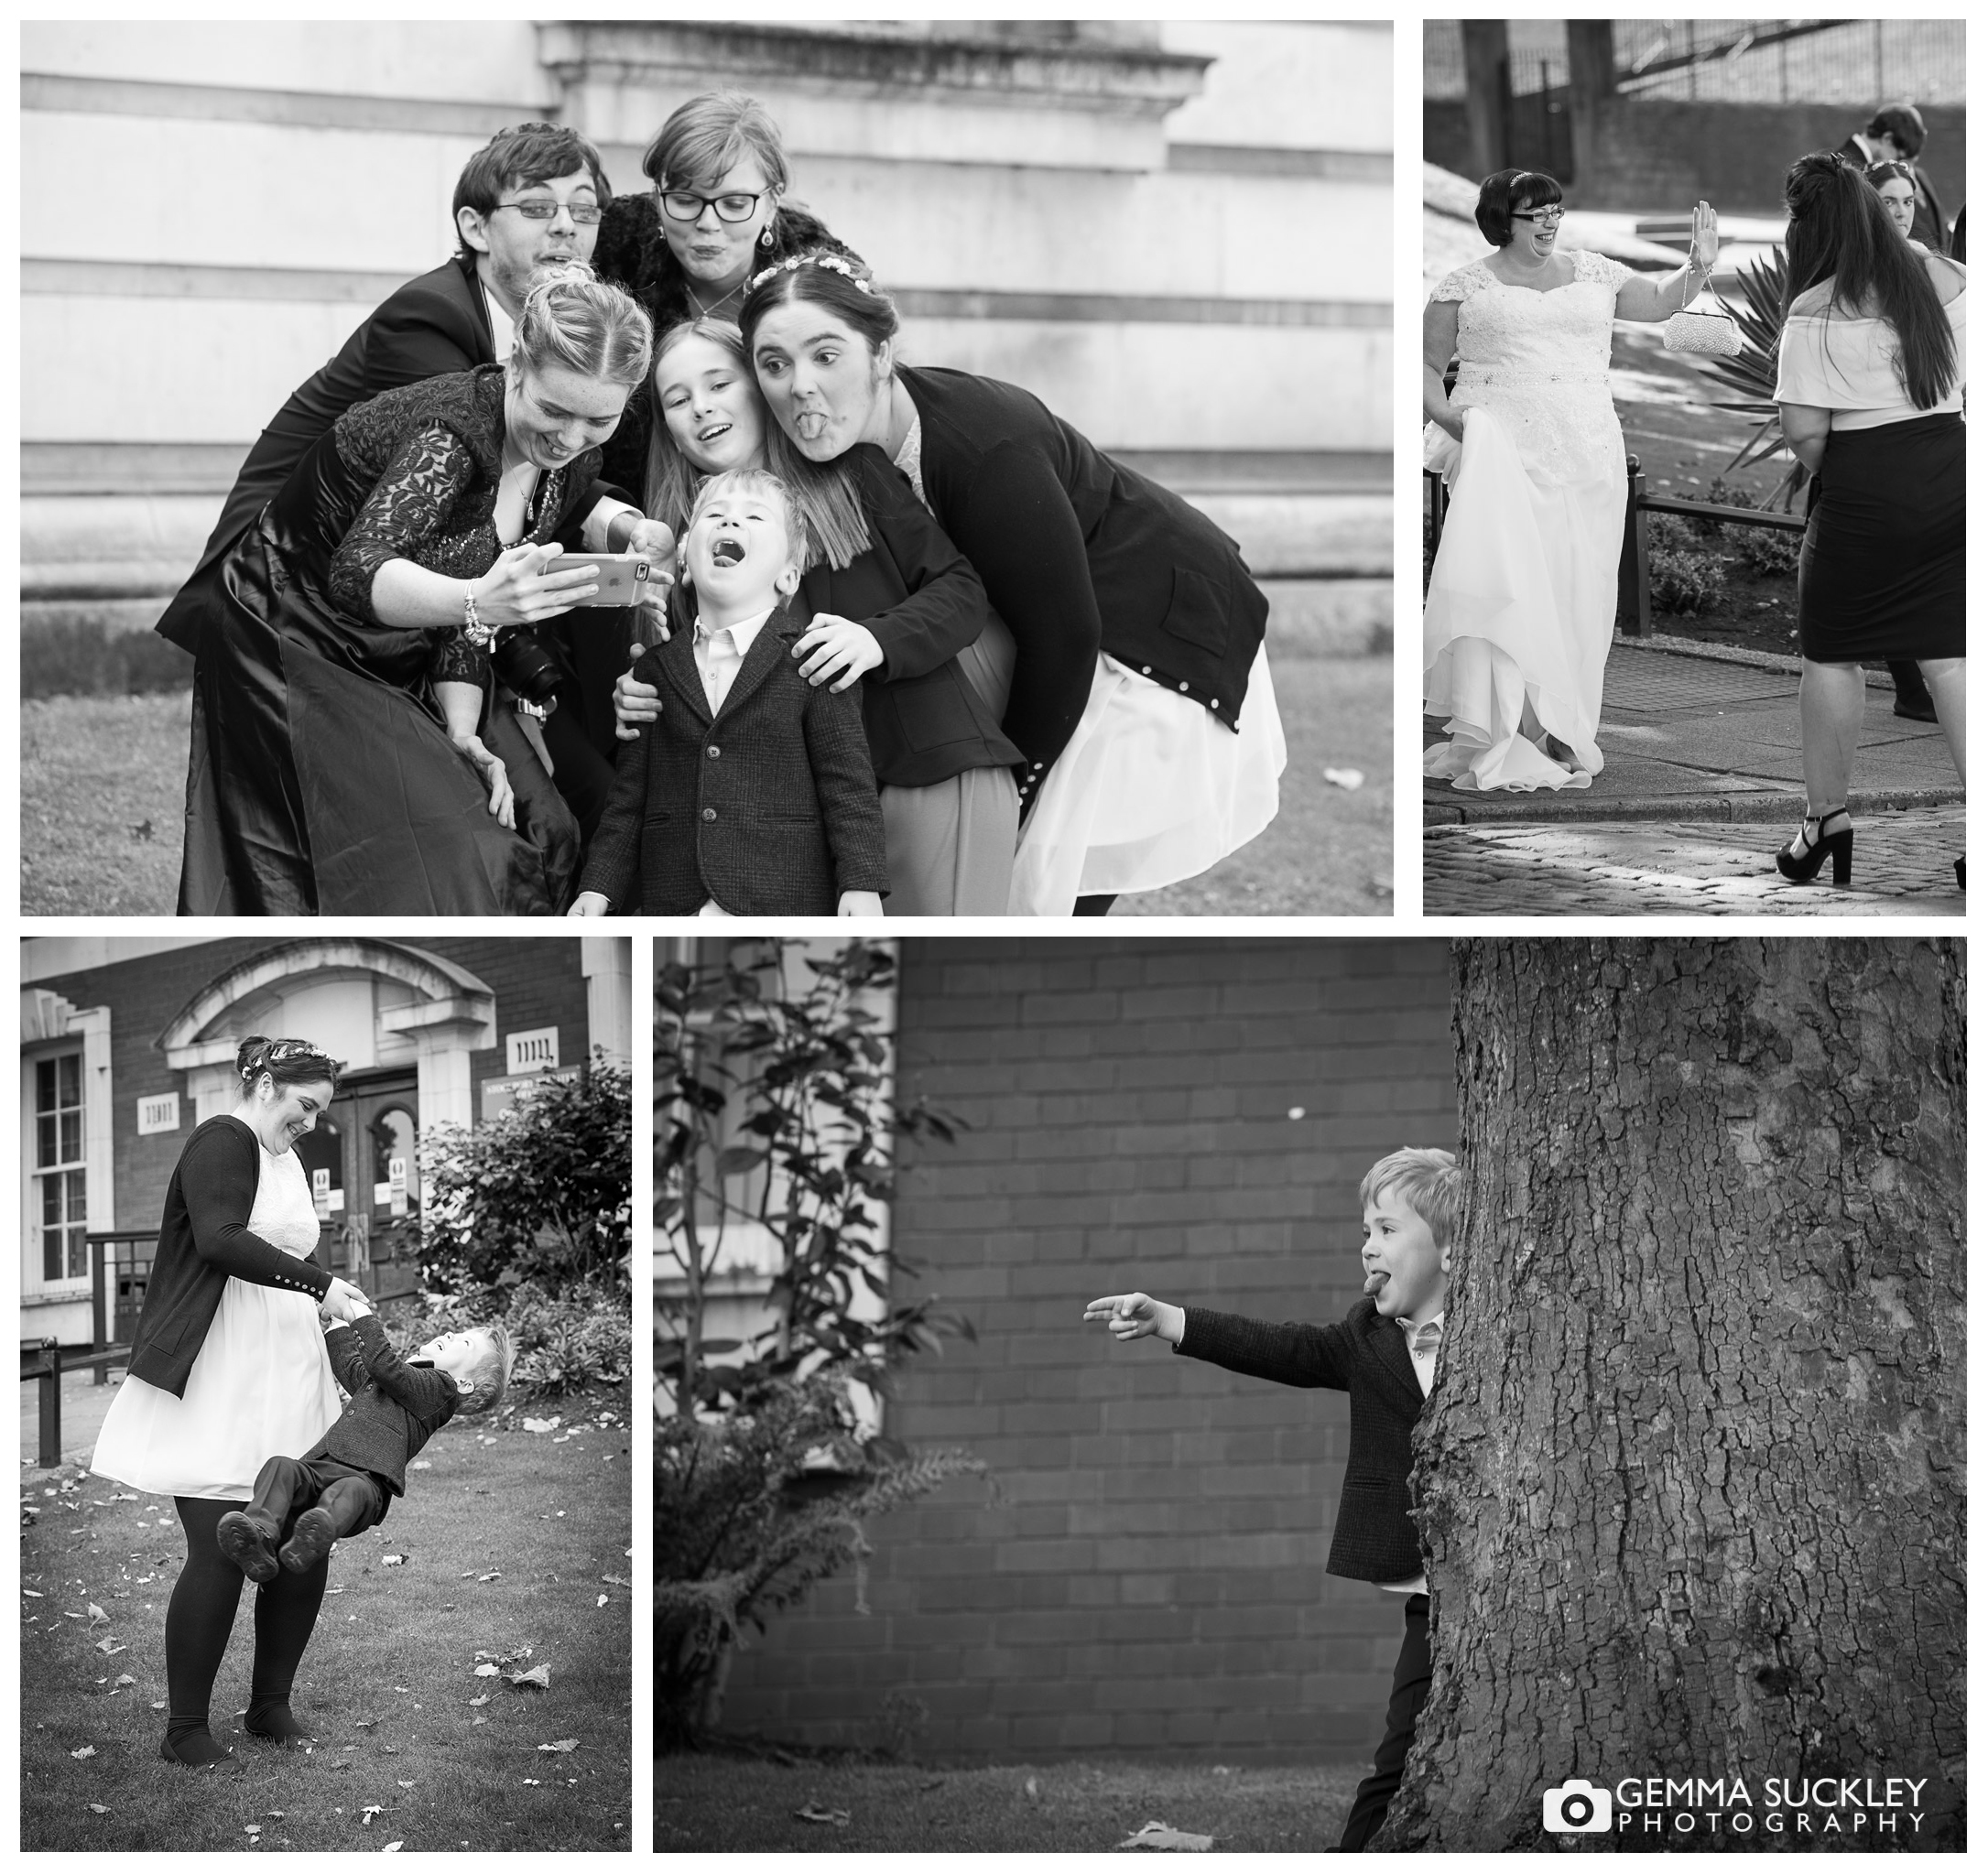 wedding-guest-stockport-wedding©gemmasuckleyphotography-4321.JPG